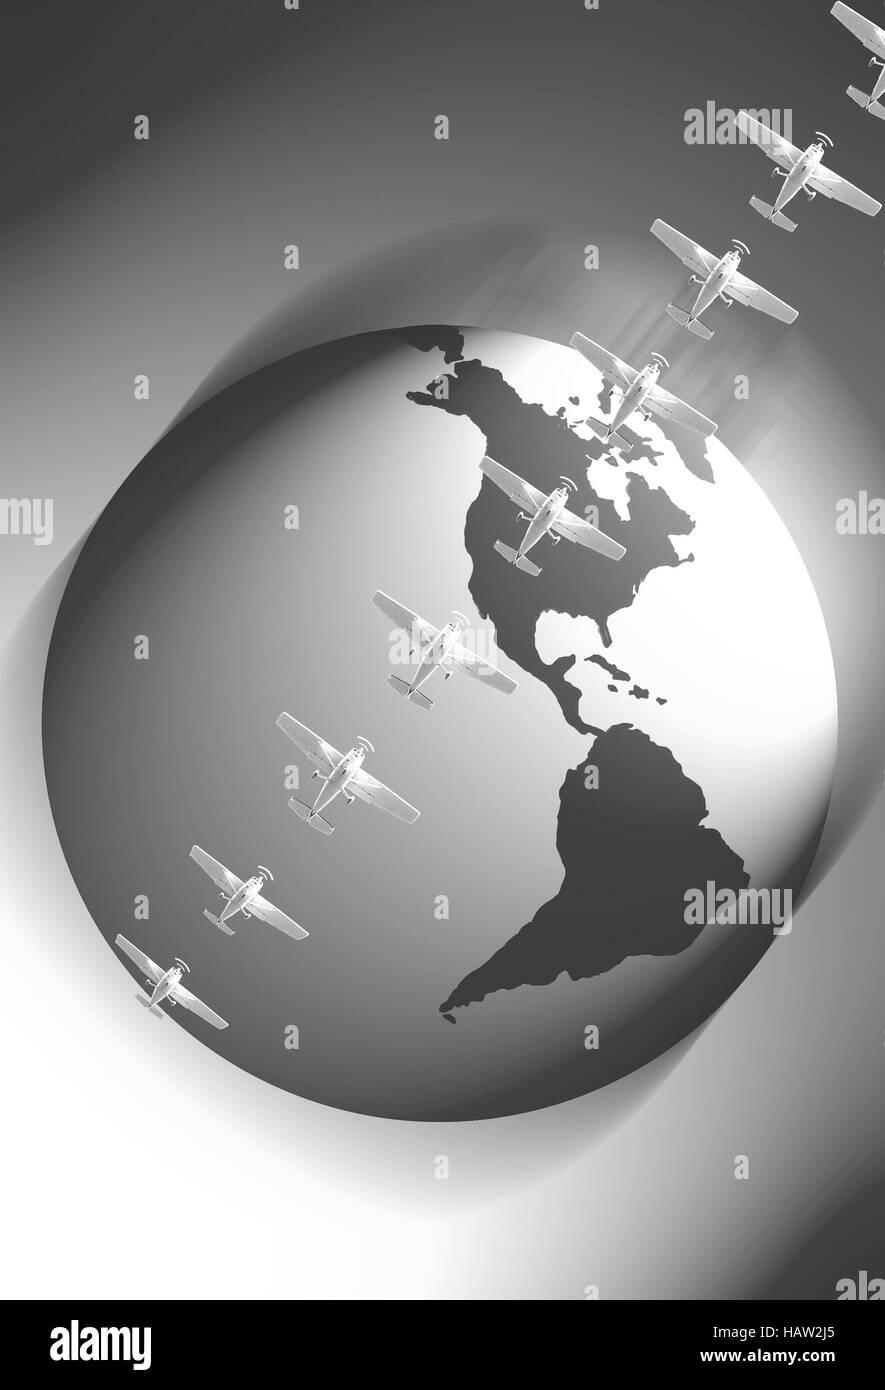 Airplanes and globe photo illustration, with Western Hemisphere - Stock Image